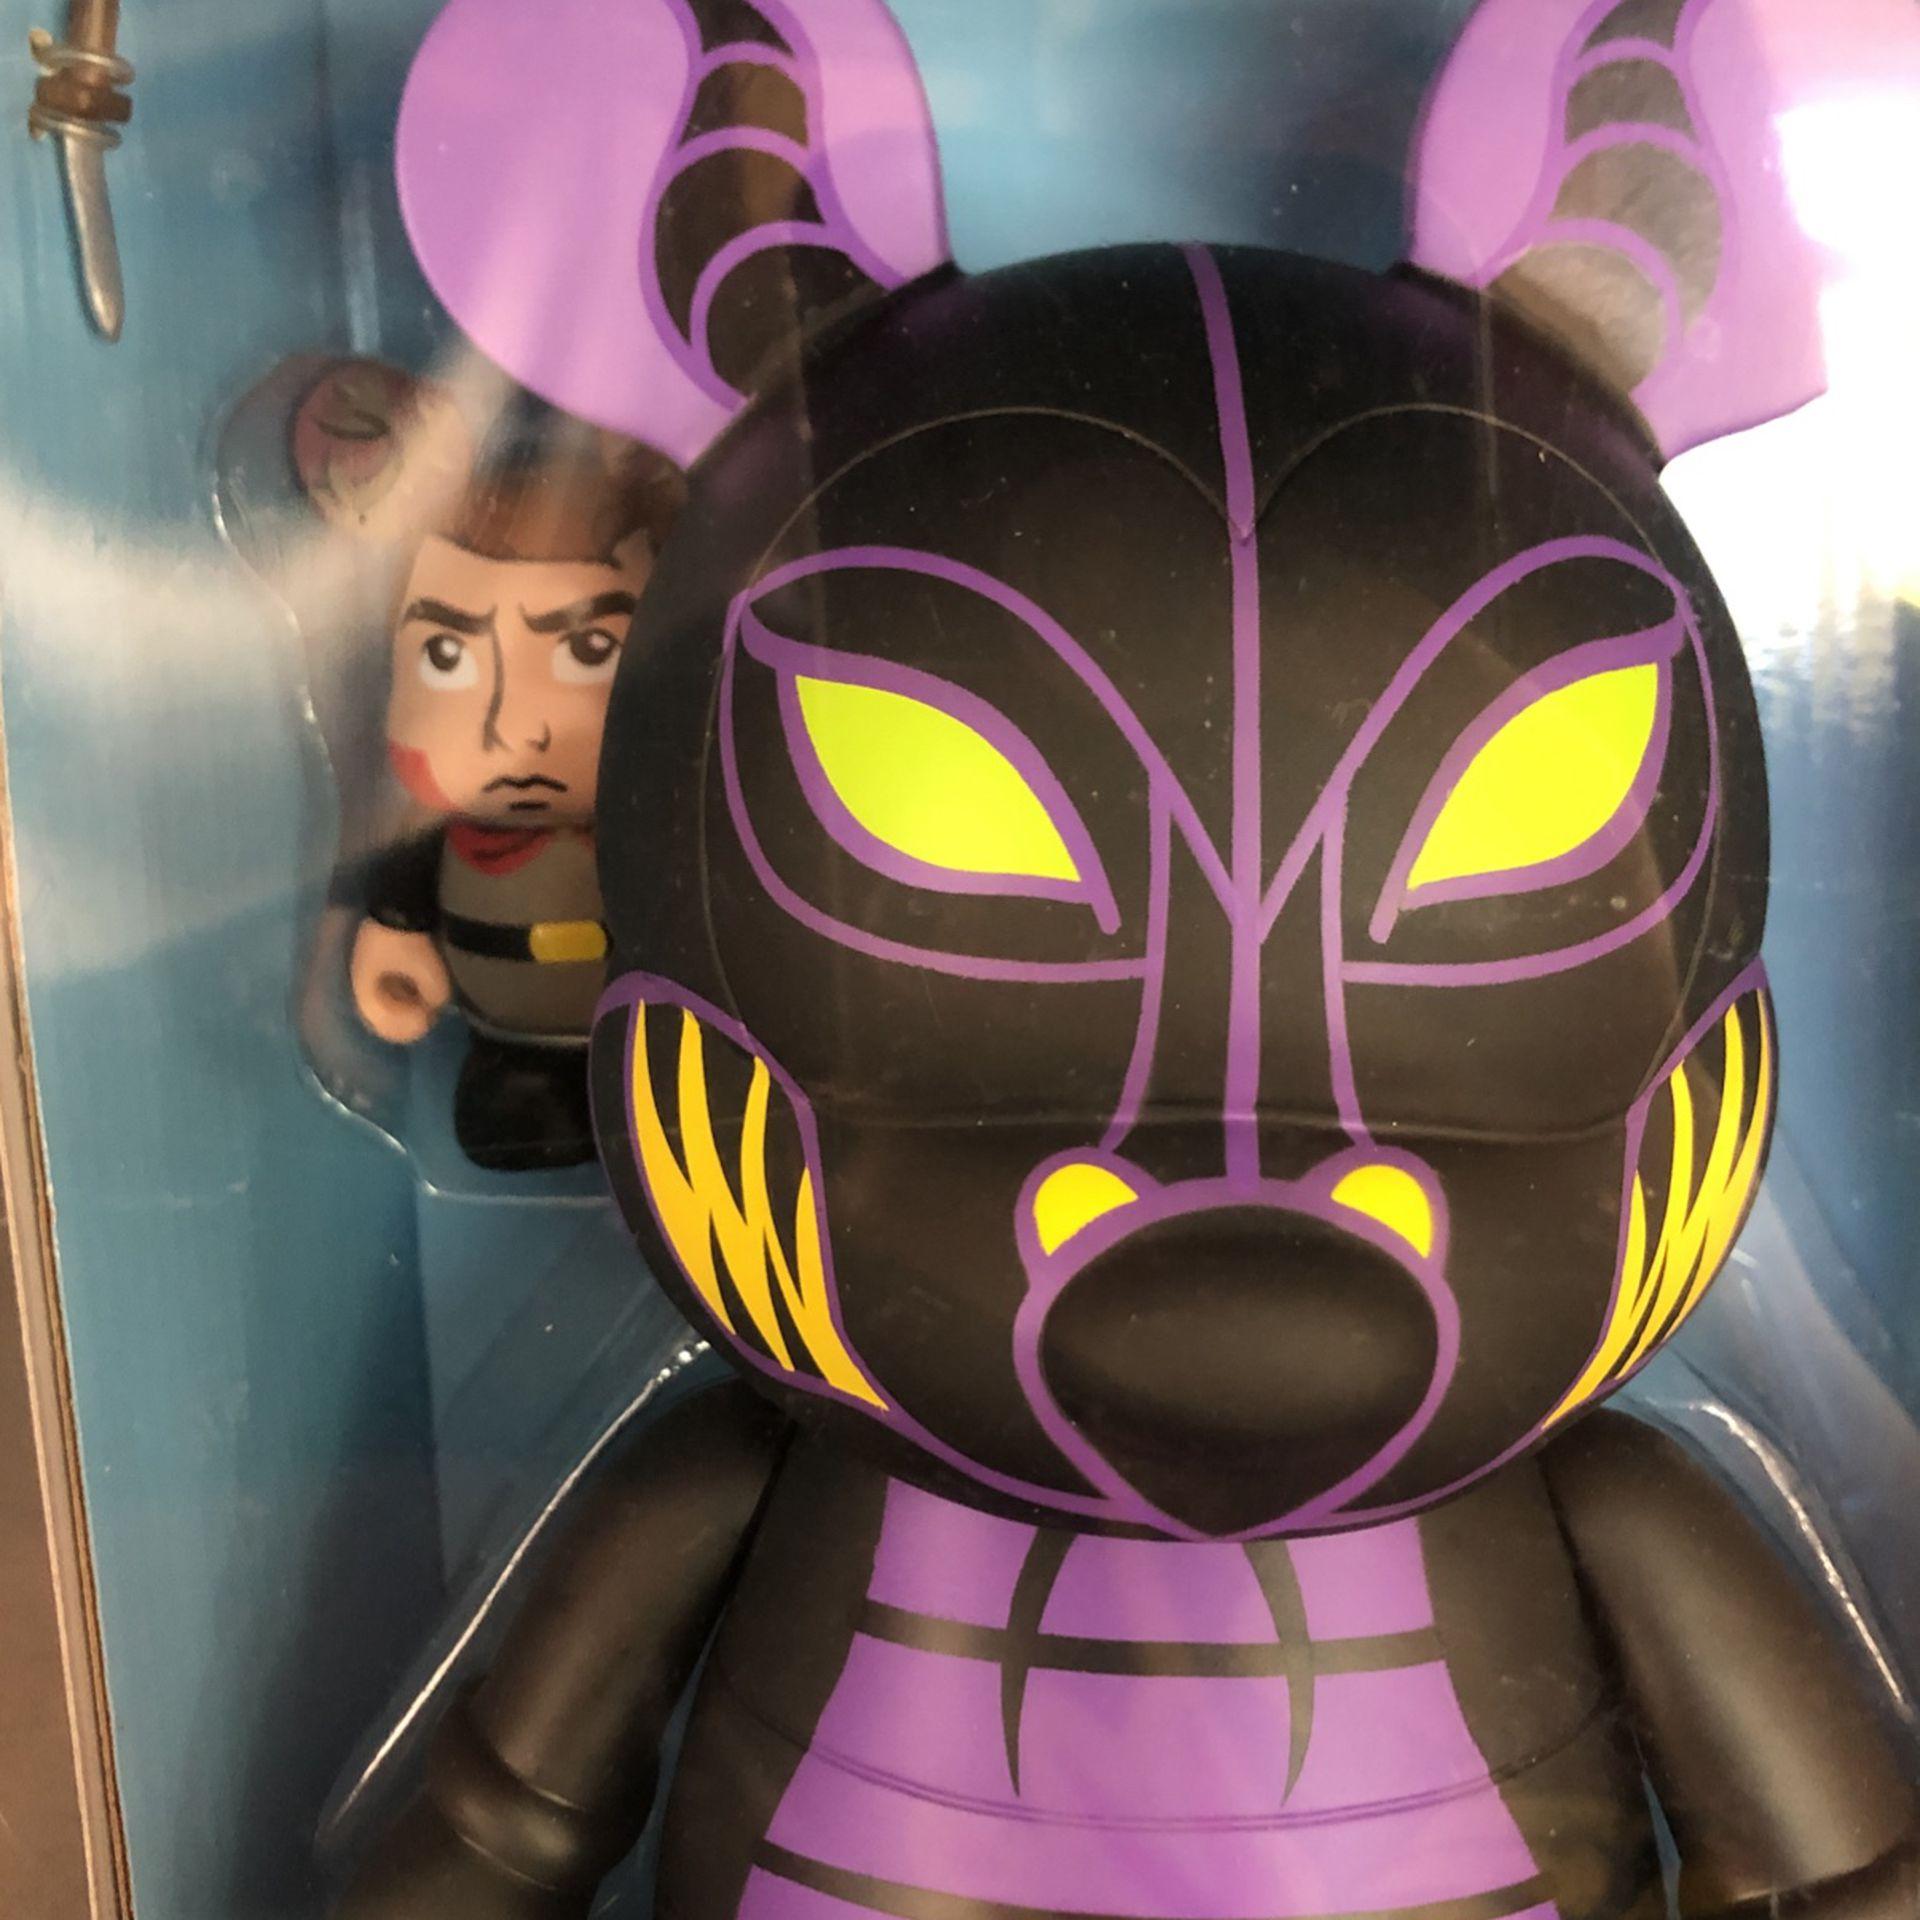 Vinylmation Animation #2 Maleficent & Prince Phillip